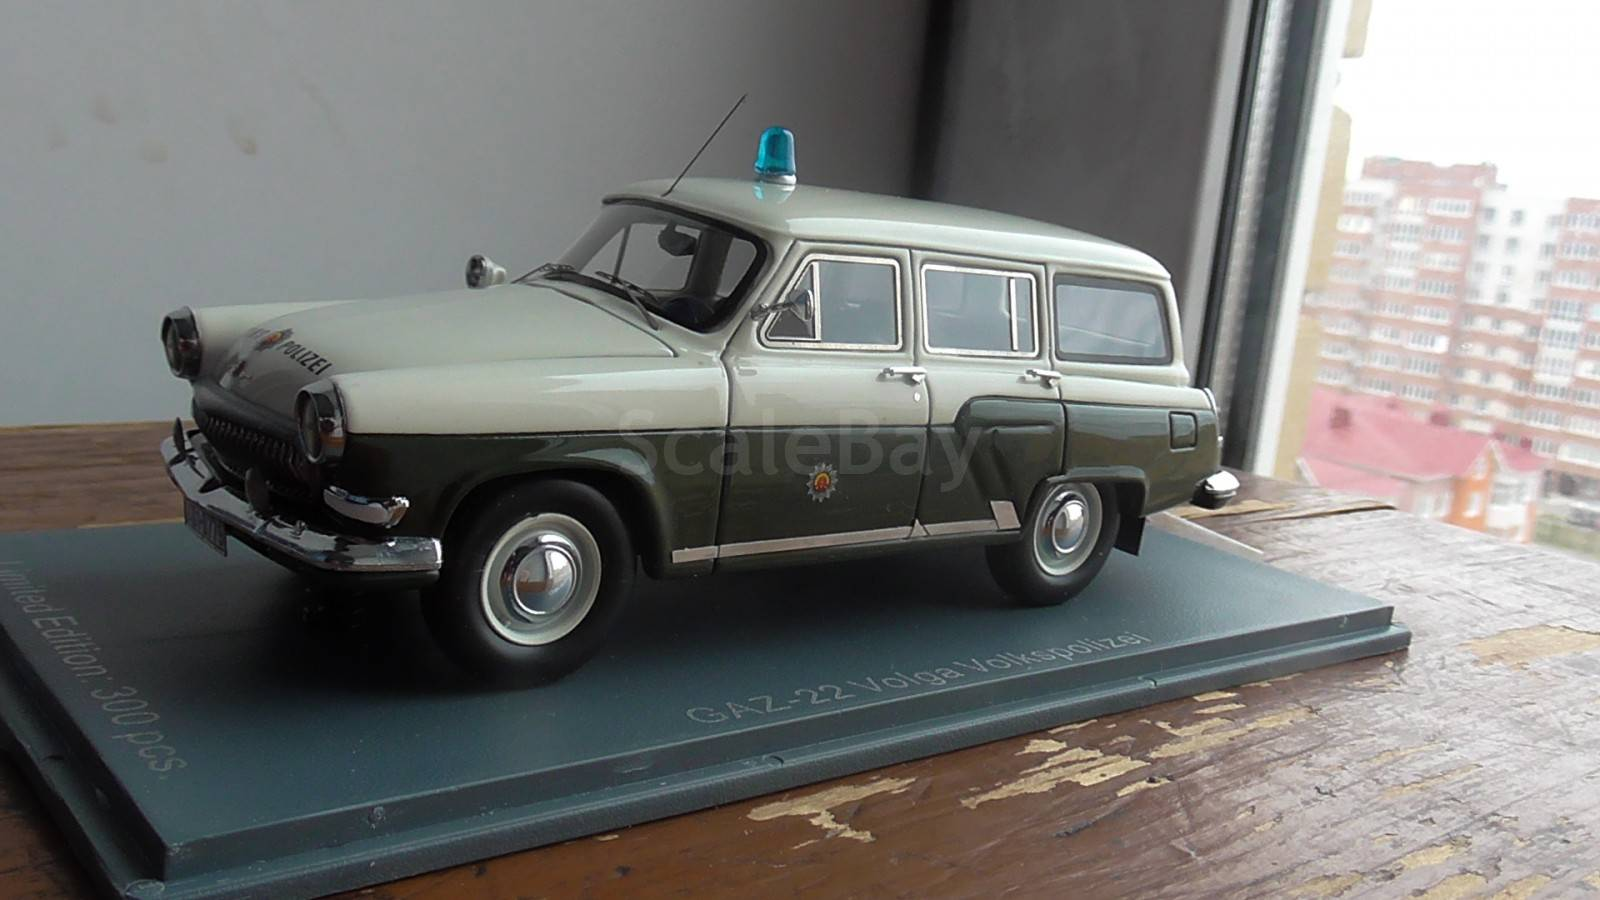 GAZ-22 volkspolizei 1:43 Neo тираж 300 шт